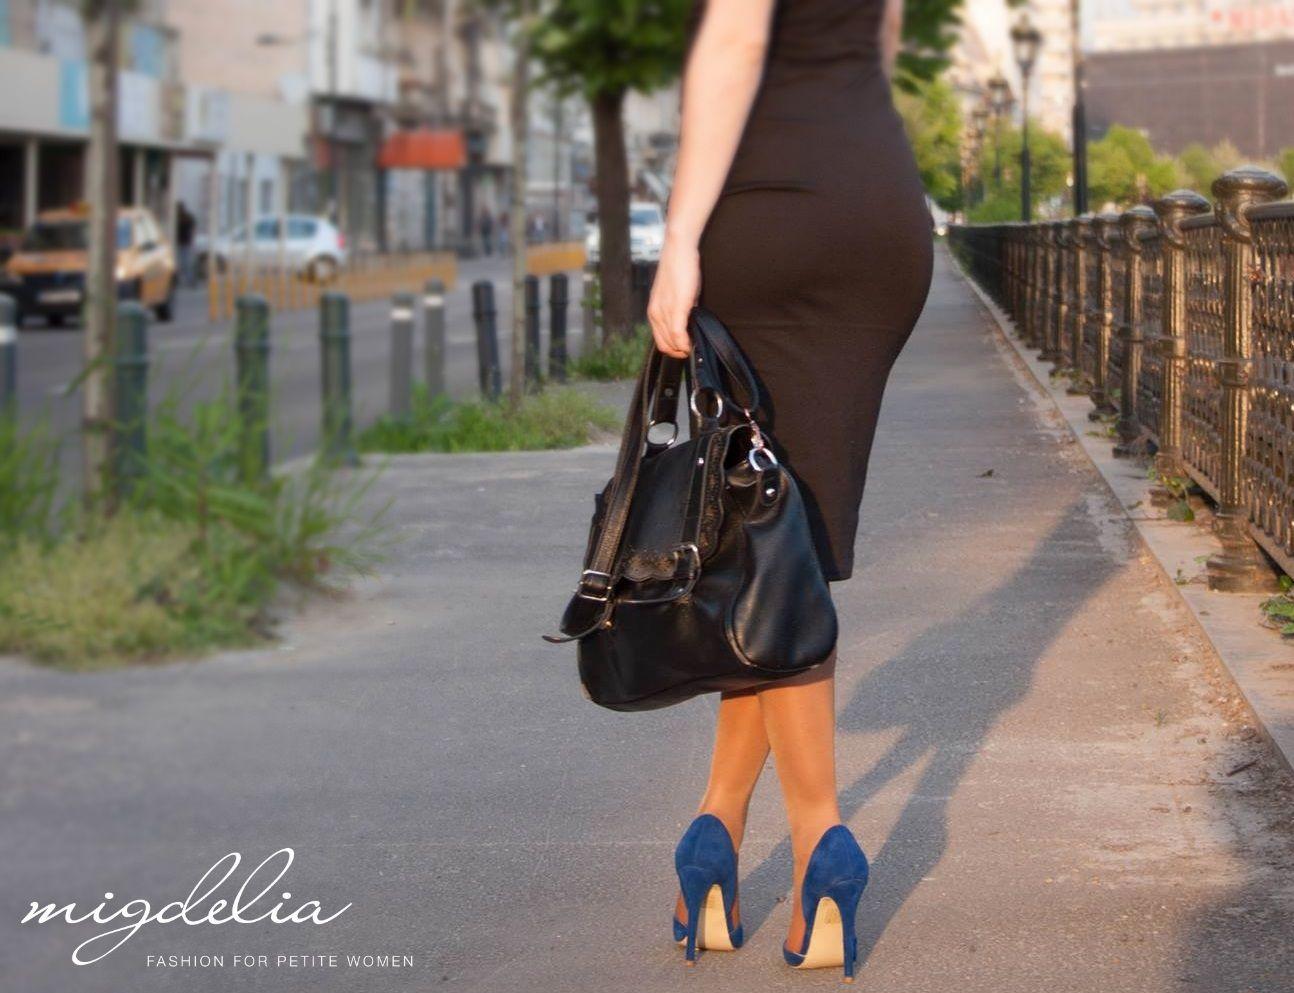 From day to night easily: midi black dress! Migdelia - fashion for petite women https://goo.gl/fMvYUw